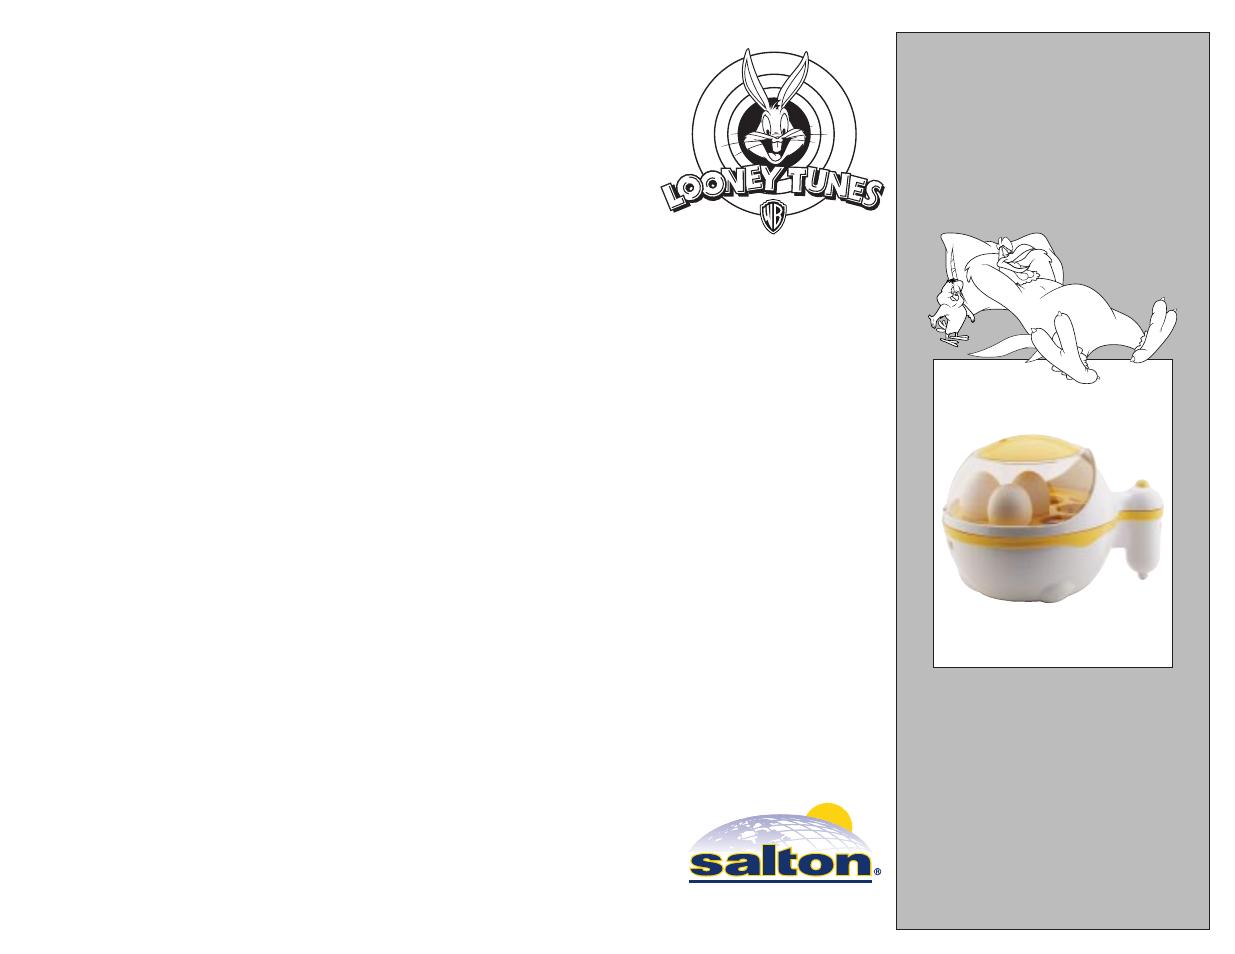 Salton wm20lt sylvester shaped waffle maker manual questions.